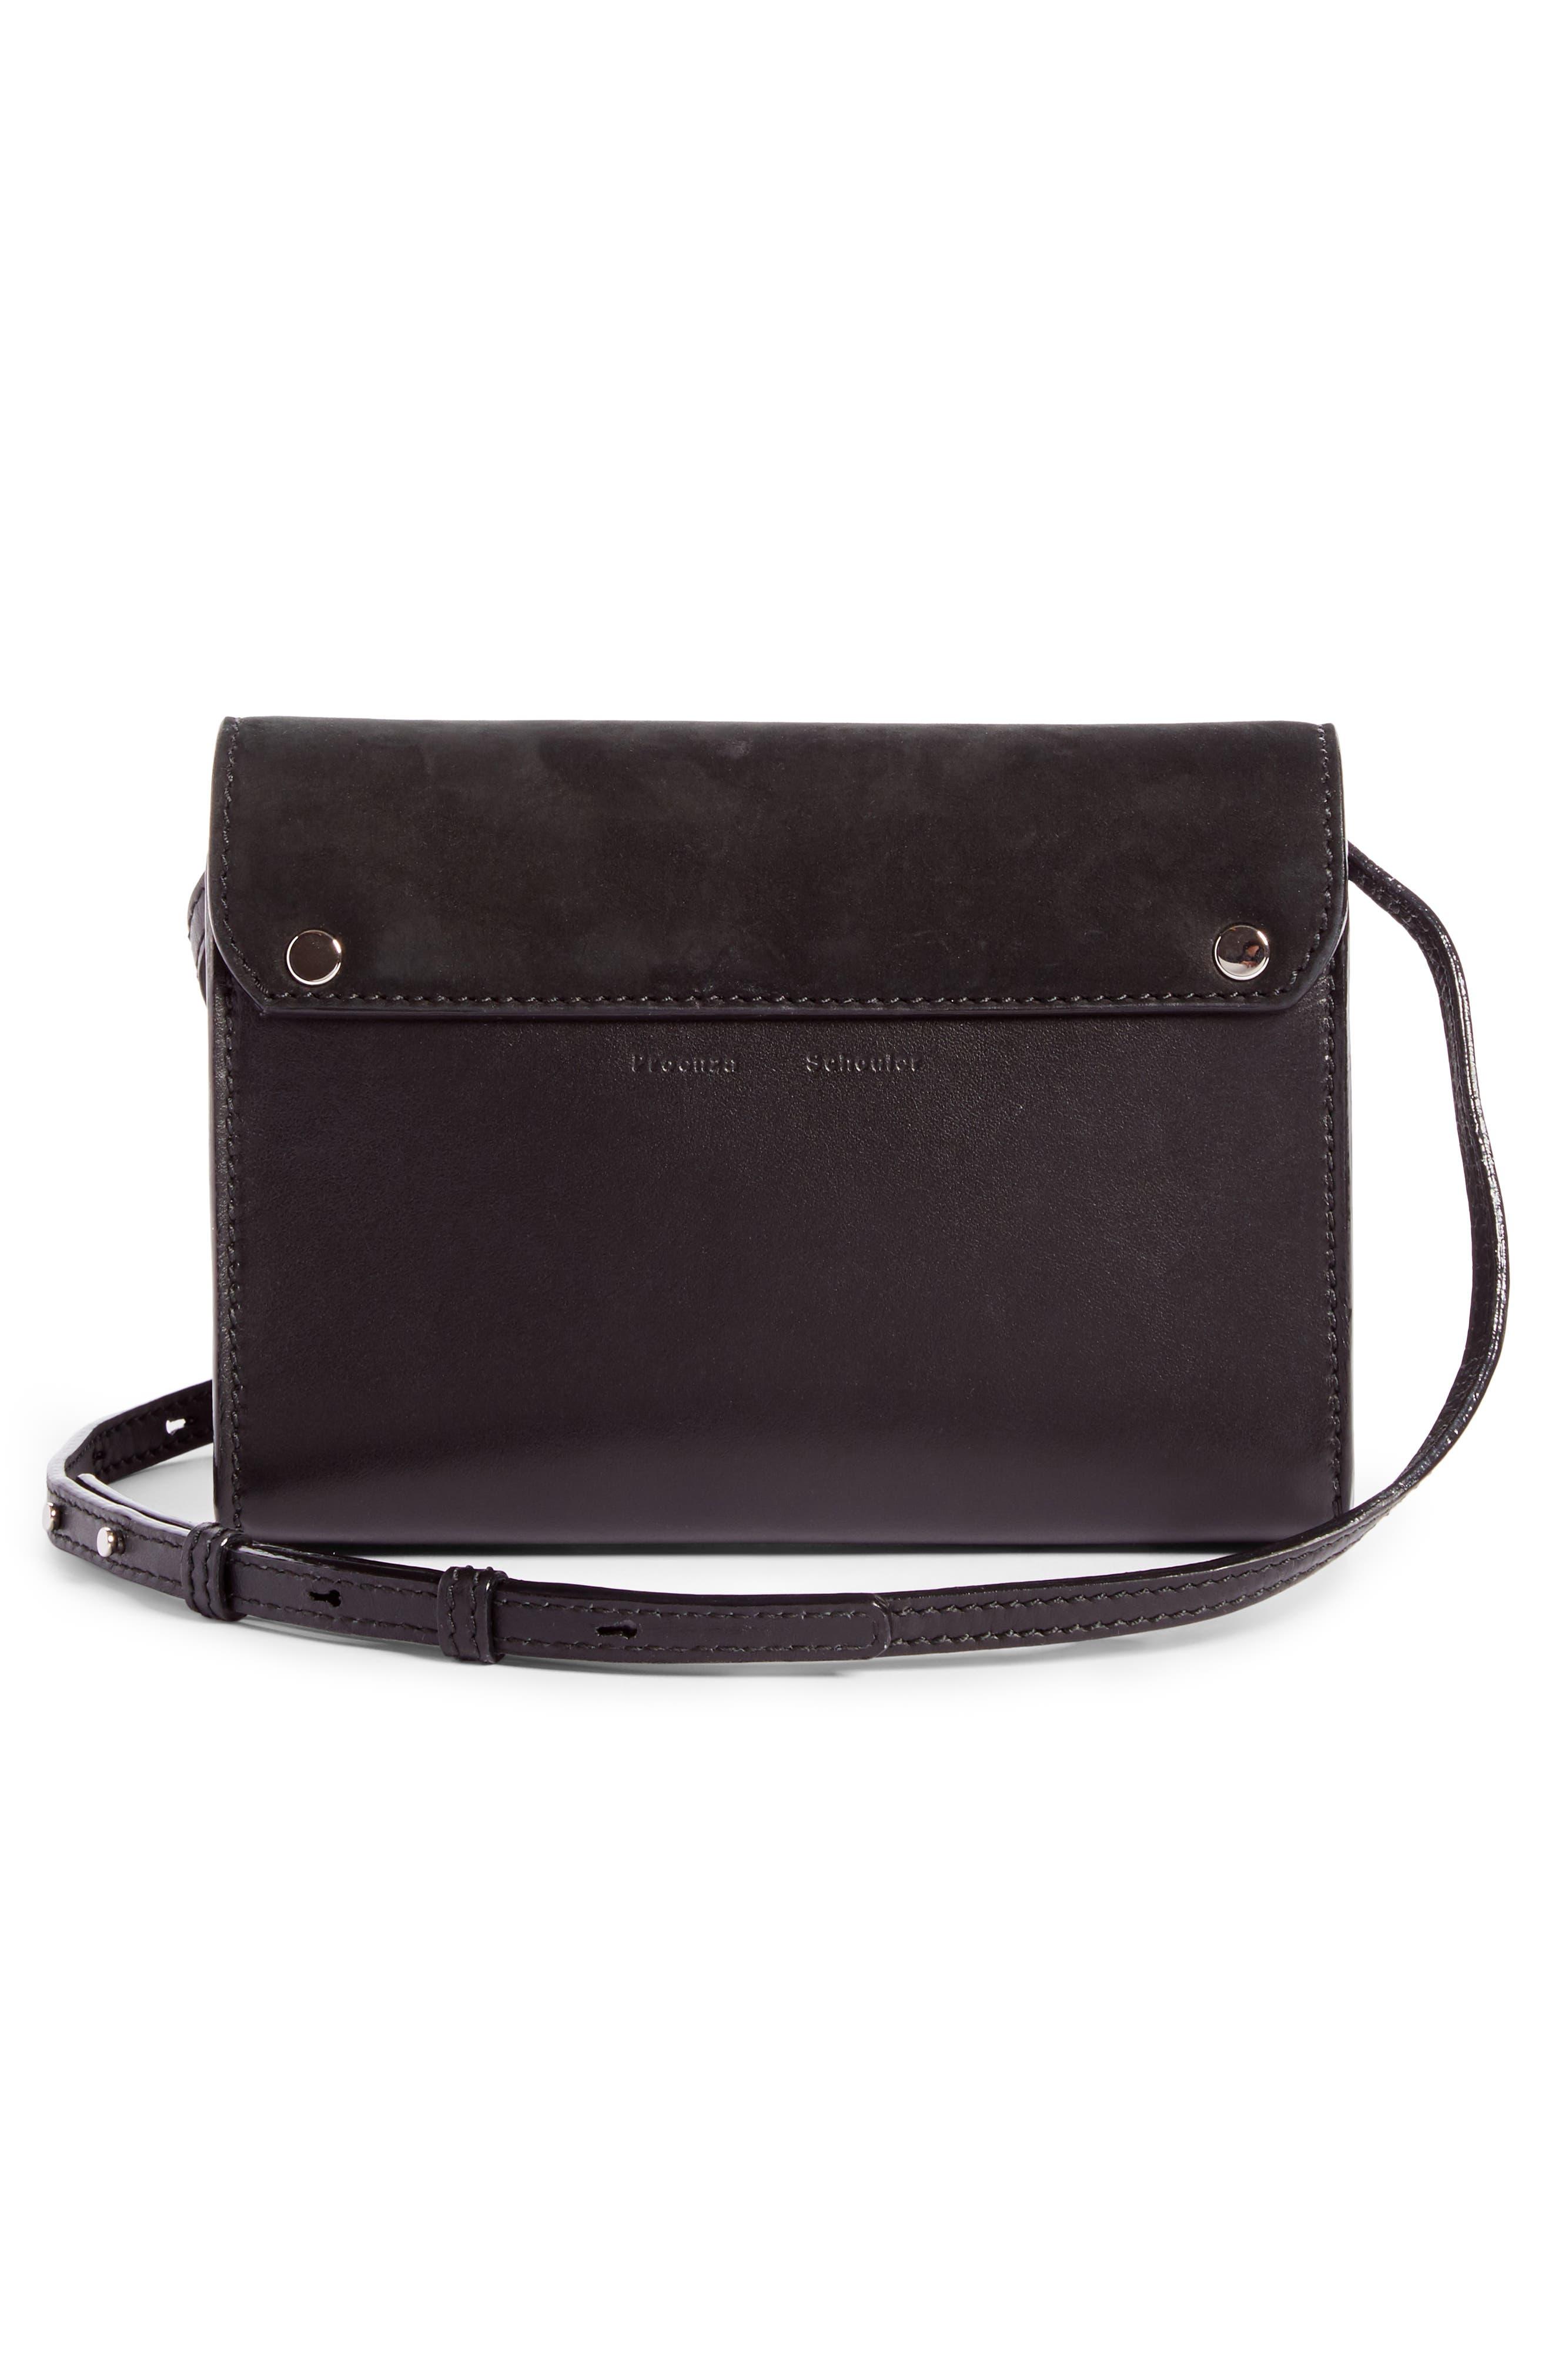 PS11 Calfskin Leather Crossbody Wallet,                             Alternate thumbnail 3, color,                             Black